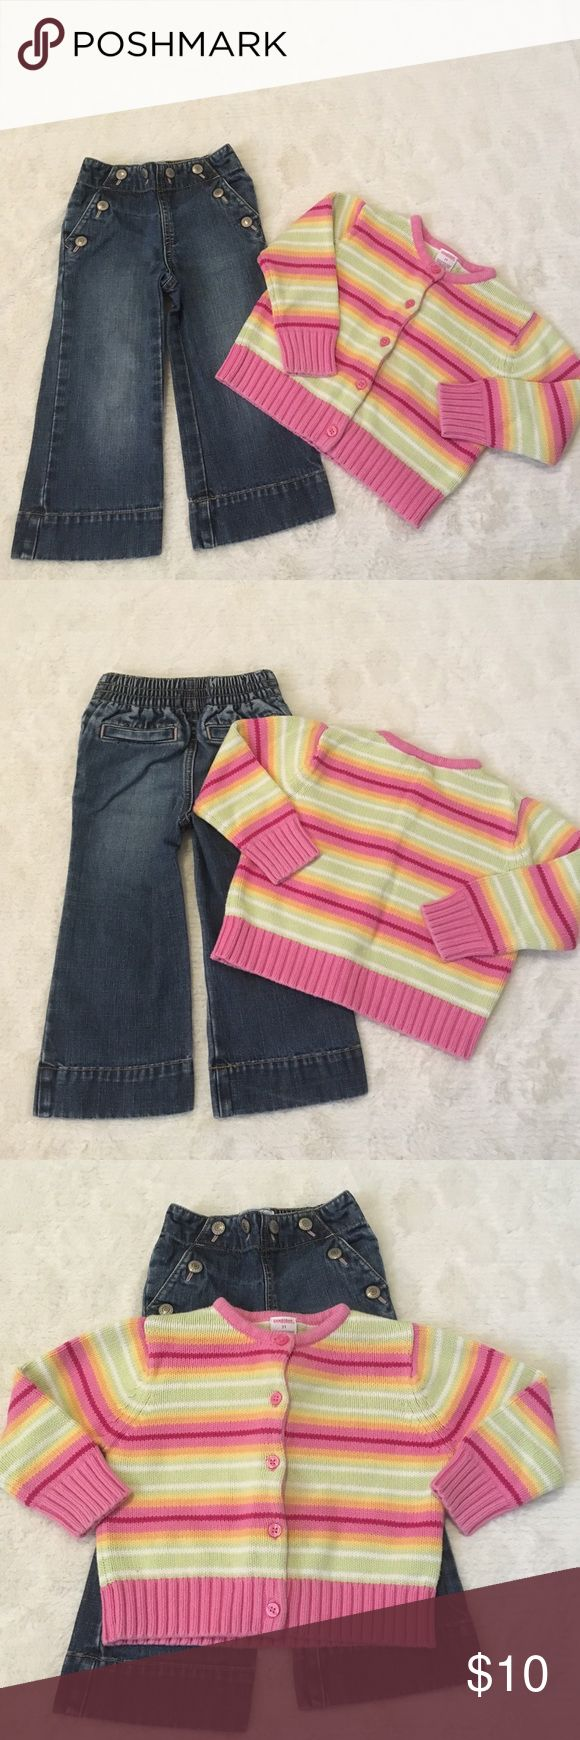 Bundle of 2 Girl's Sz 2T Blue Jean pants & Sweater #1- 100% Cotton-Super Cute Old Navy Sz 2T Pull up blue Jean pants-4 pockets-elastic waist #2-100% Cotton-Super Cute Gymboree Sz 2T Pink Multi Color Cardigan Button Down Sweater Gymboree/Old Navy Other